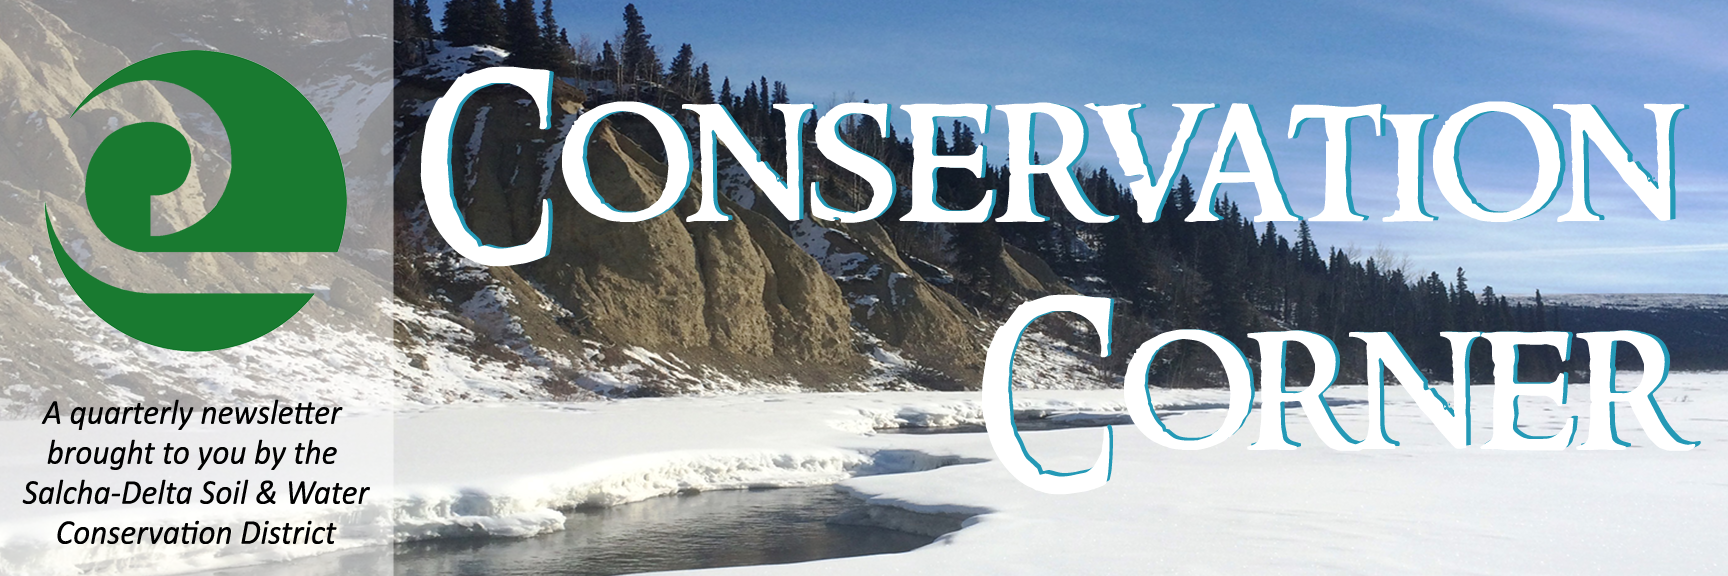 Conservation Corner newsletter